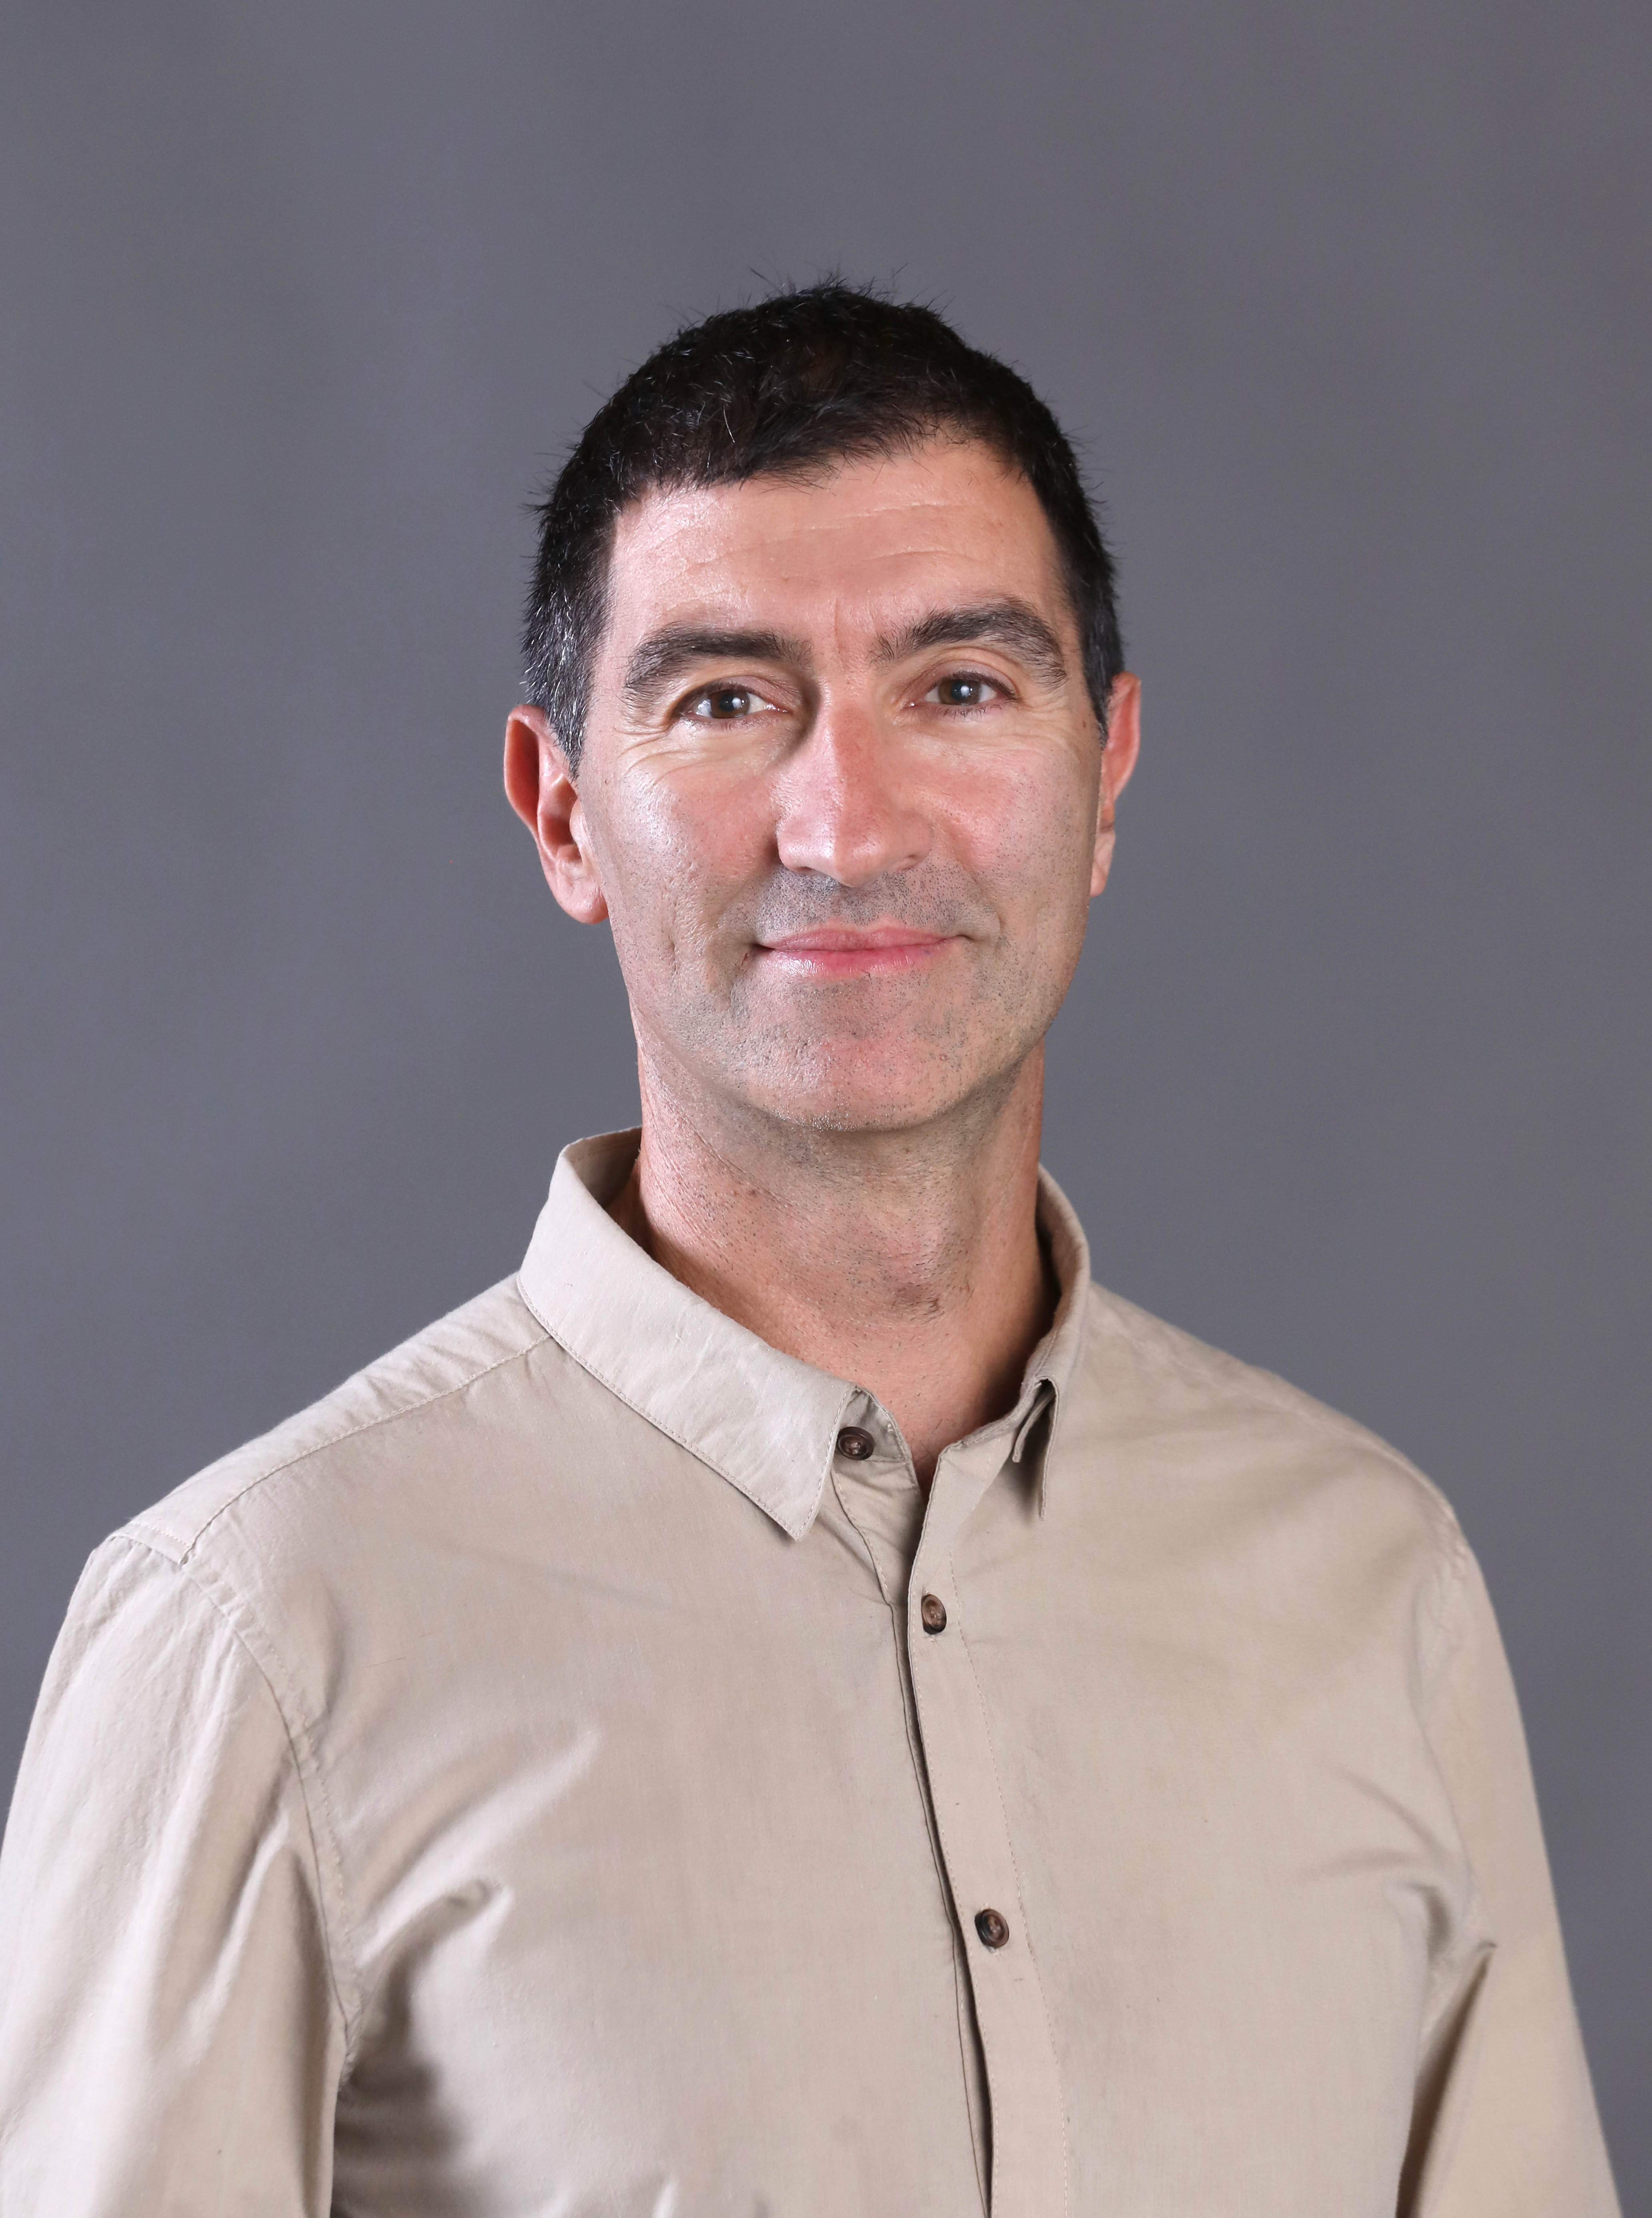 Dr Jonathan Lionel Fox